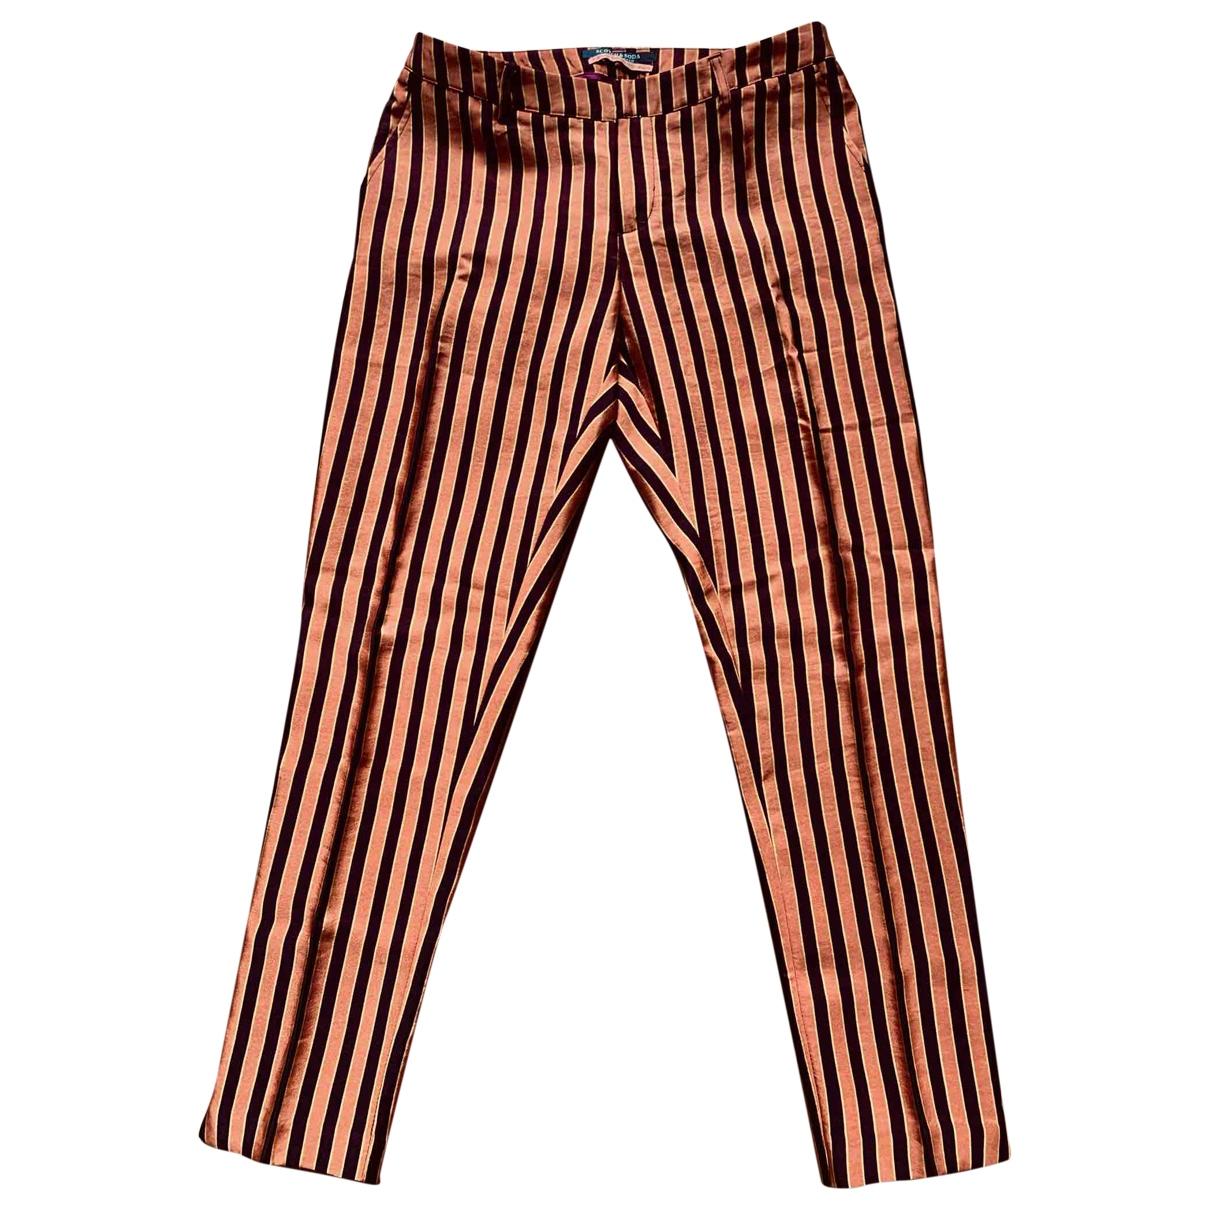 Scotch & Soda \N Trousers for Women S International